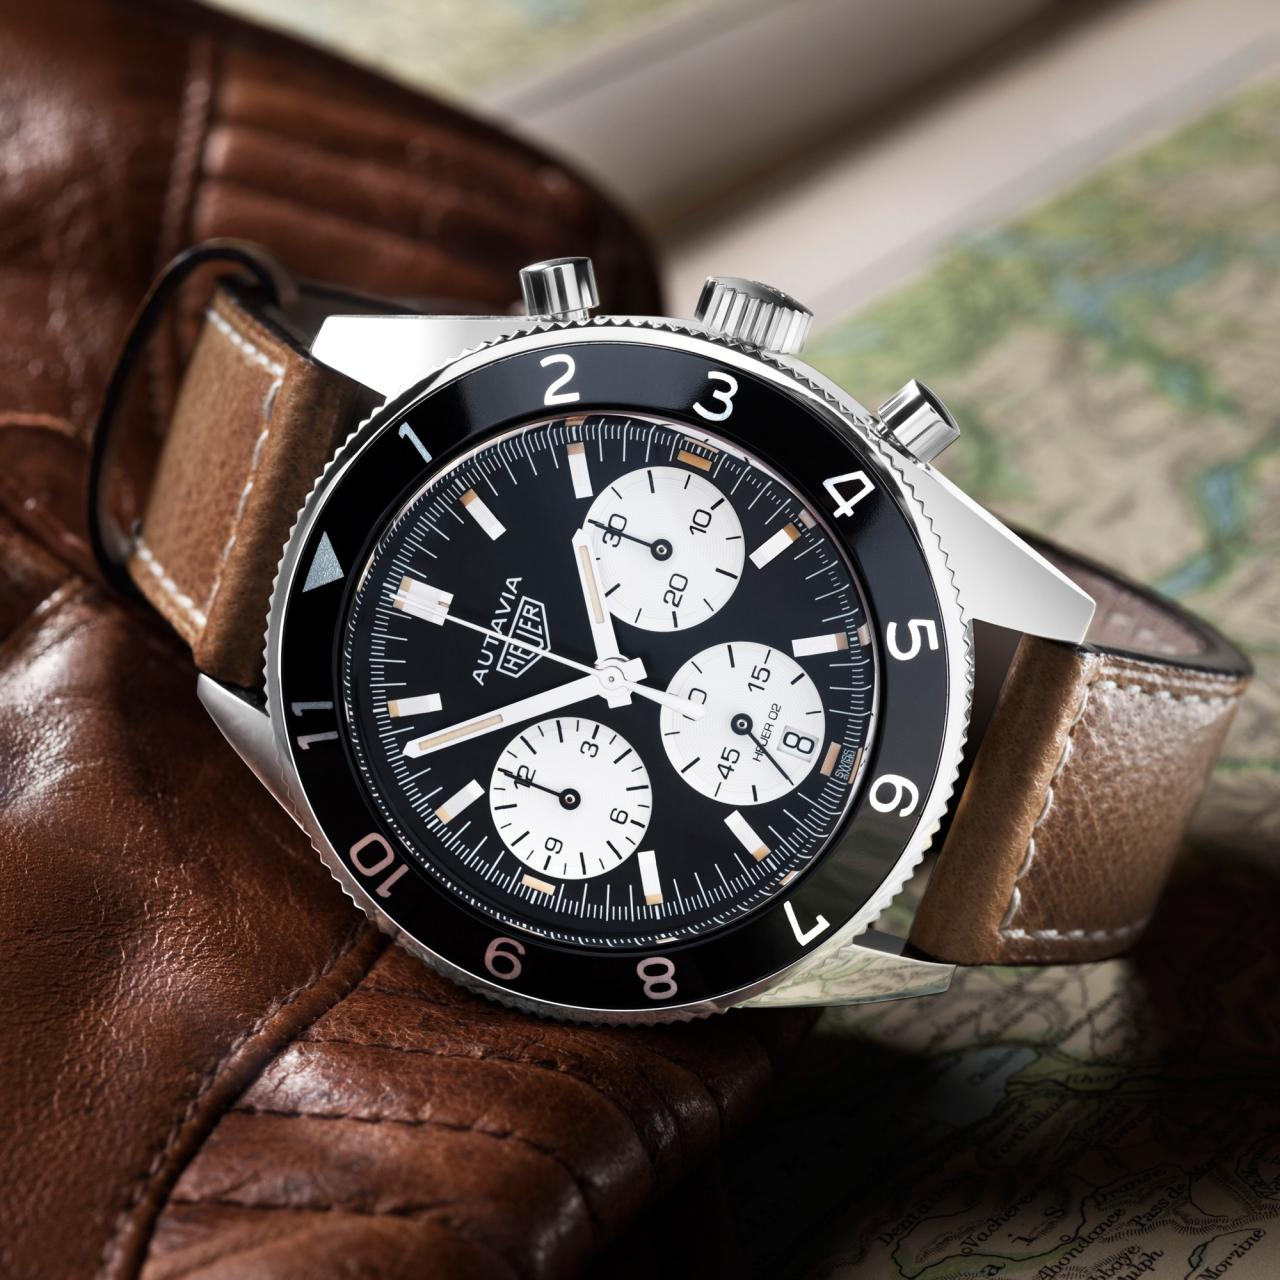 2017 TAG Heuer Autavia chronograph